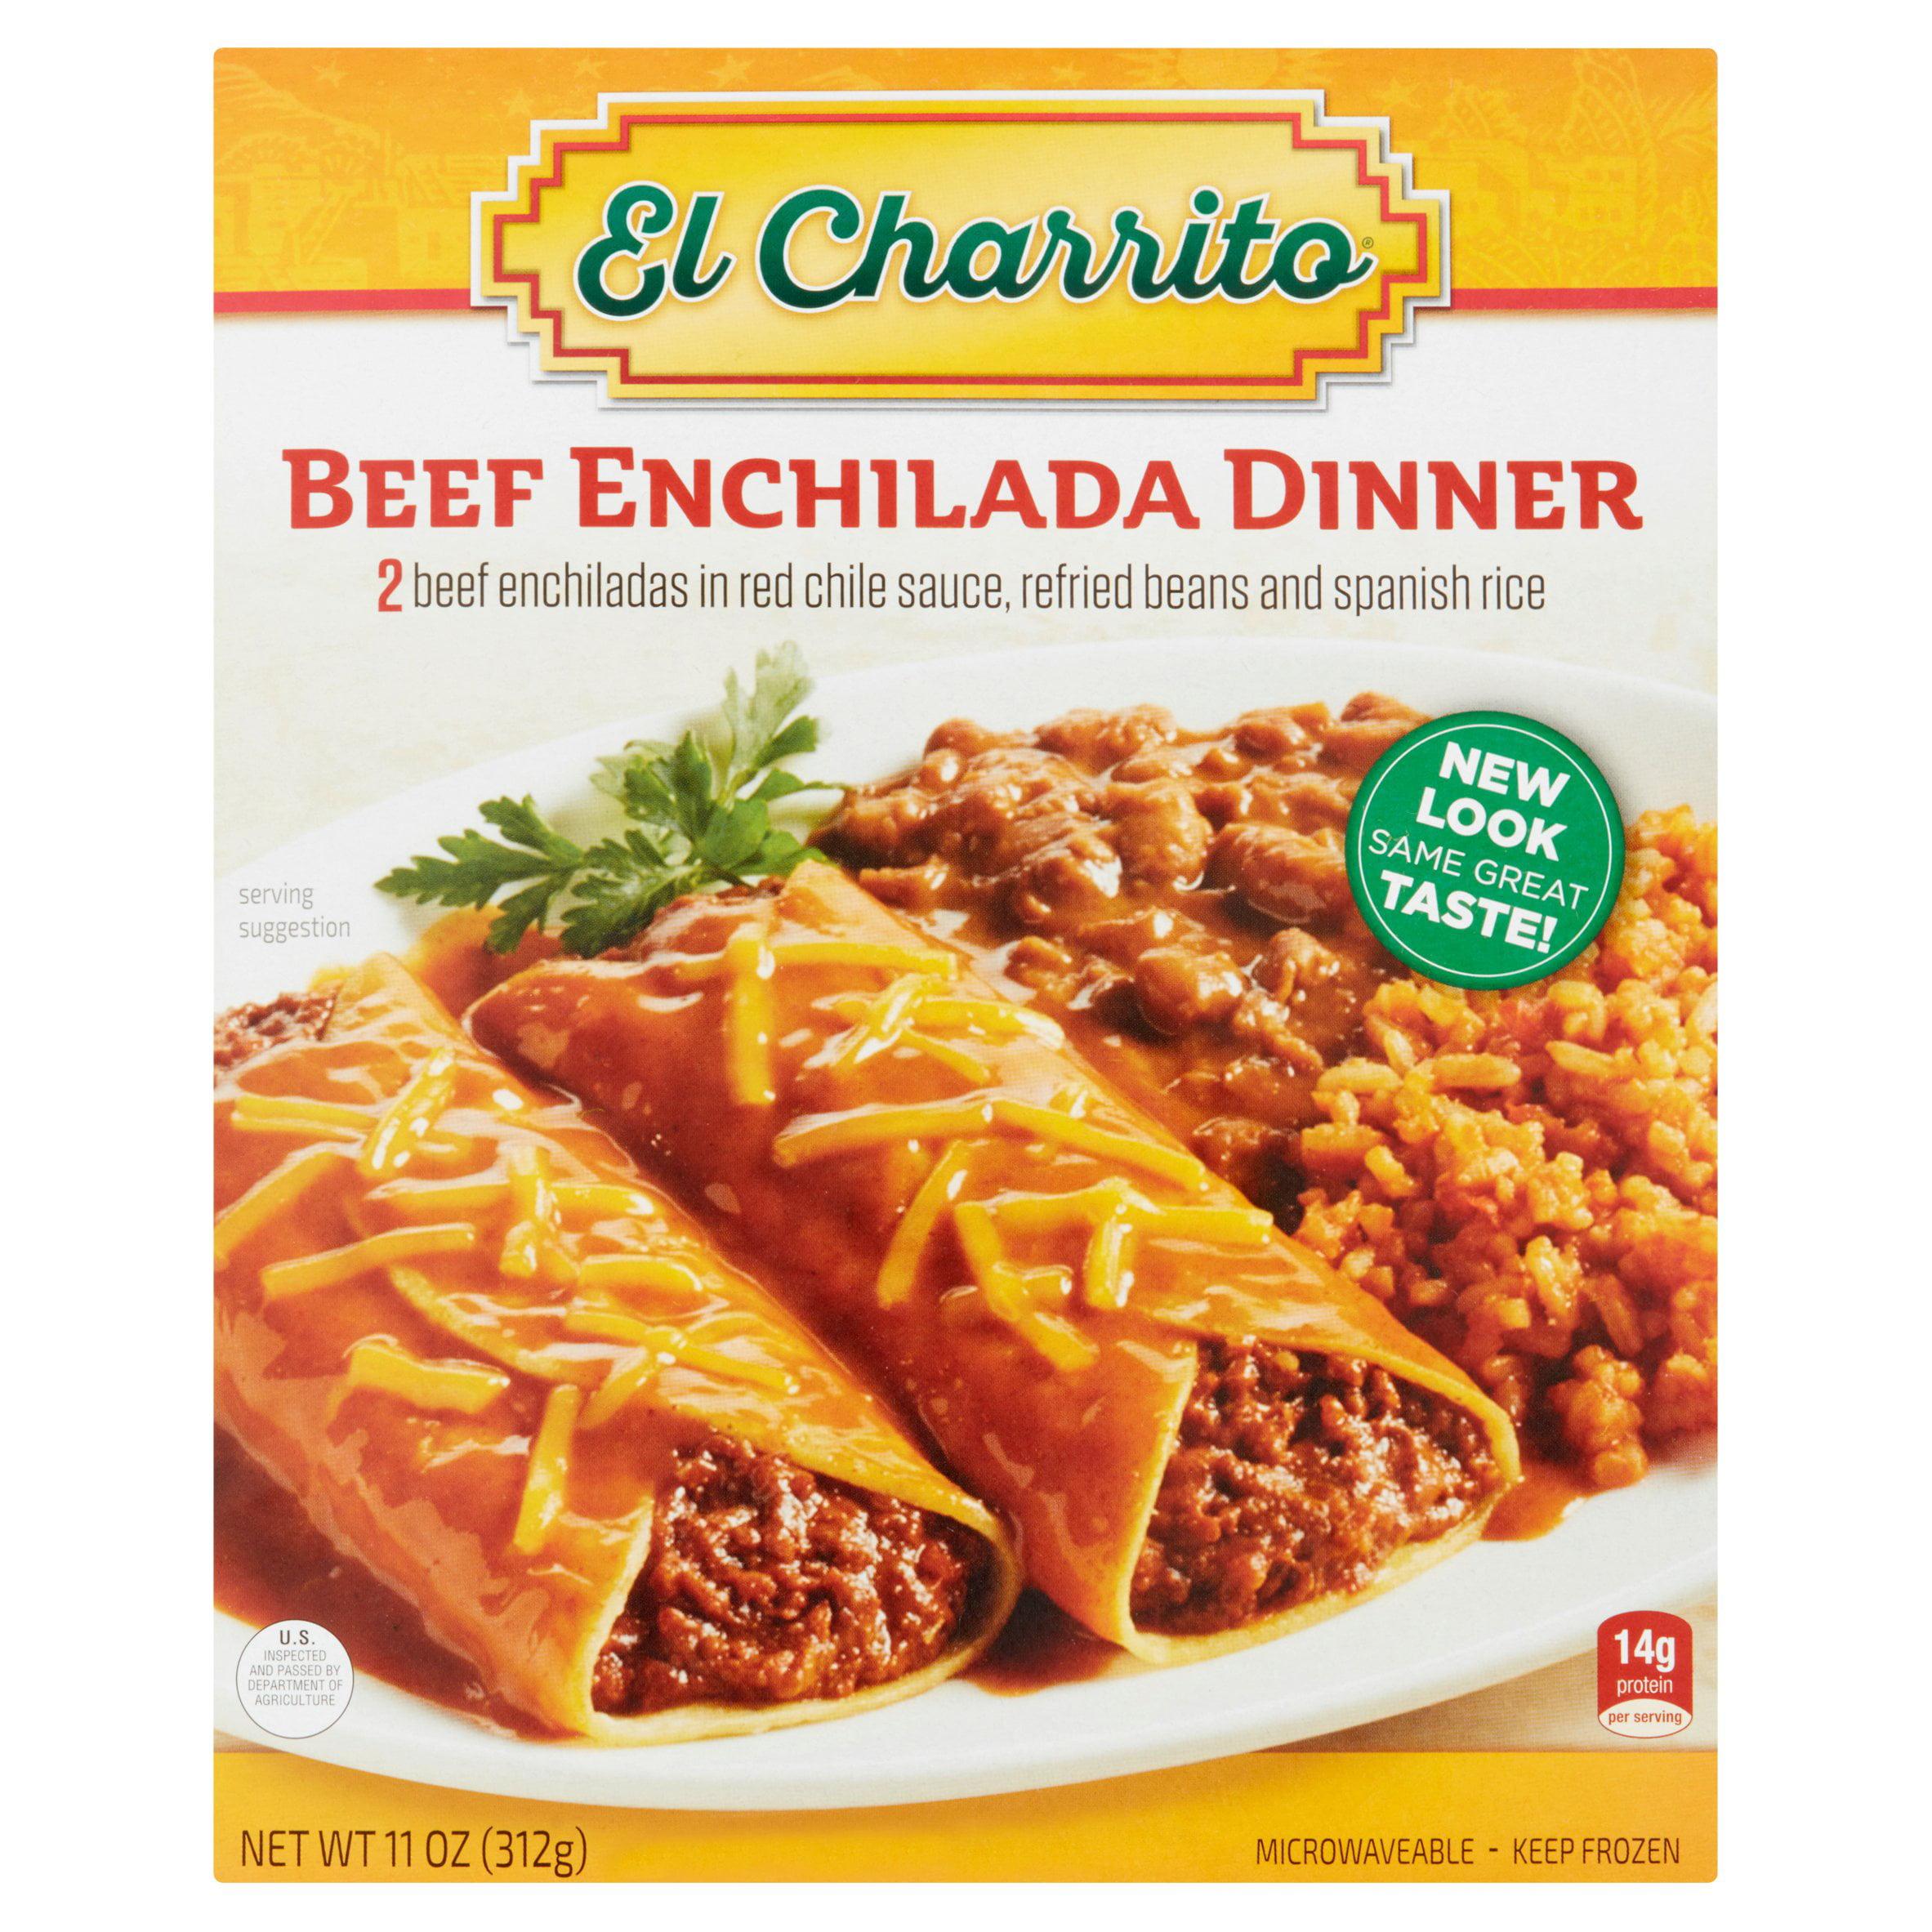 El Charrito™ Beef Enchilada Dinner 11 oz Box Walmart